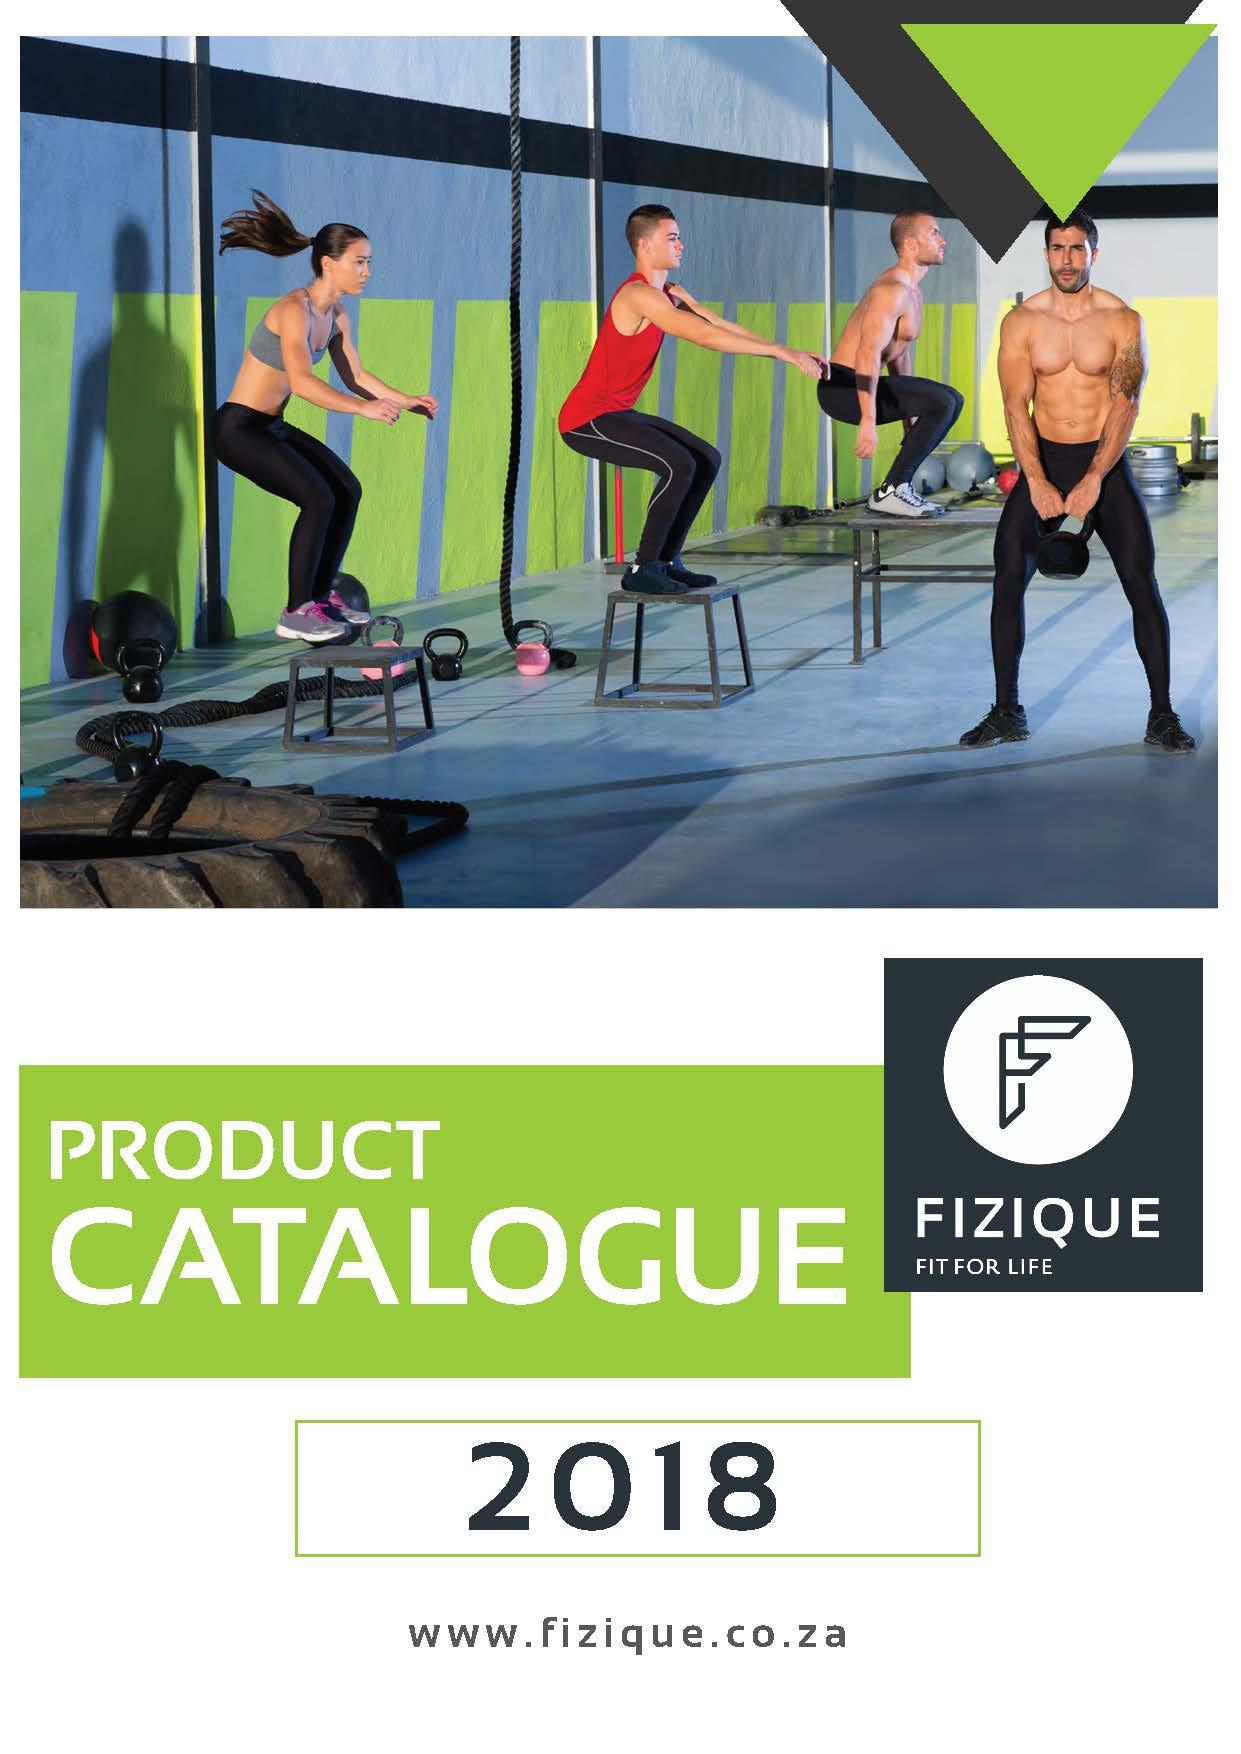 catalogue-2018-cover.jpg